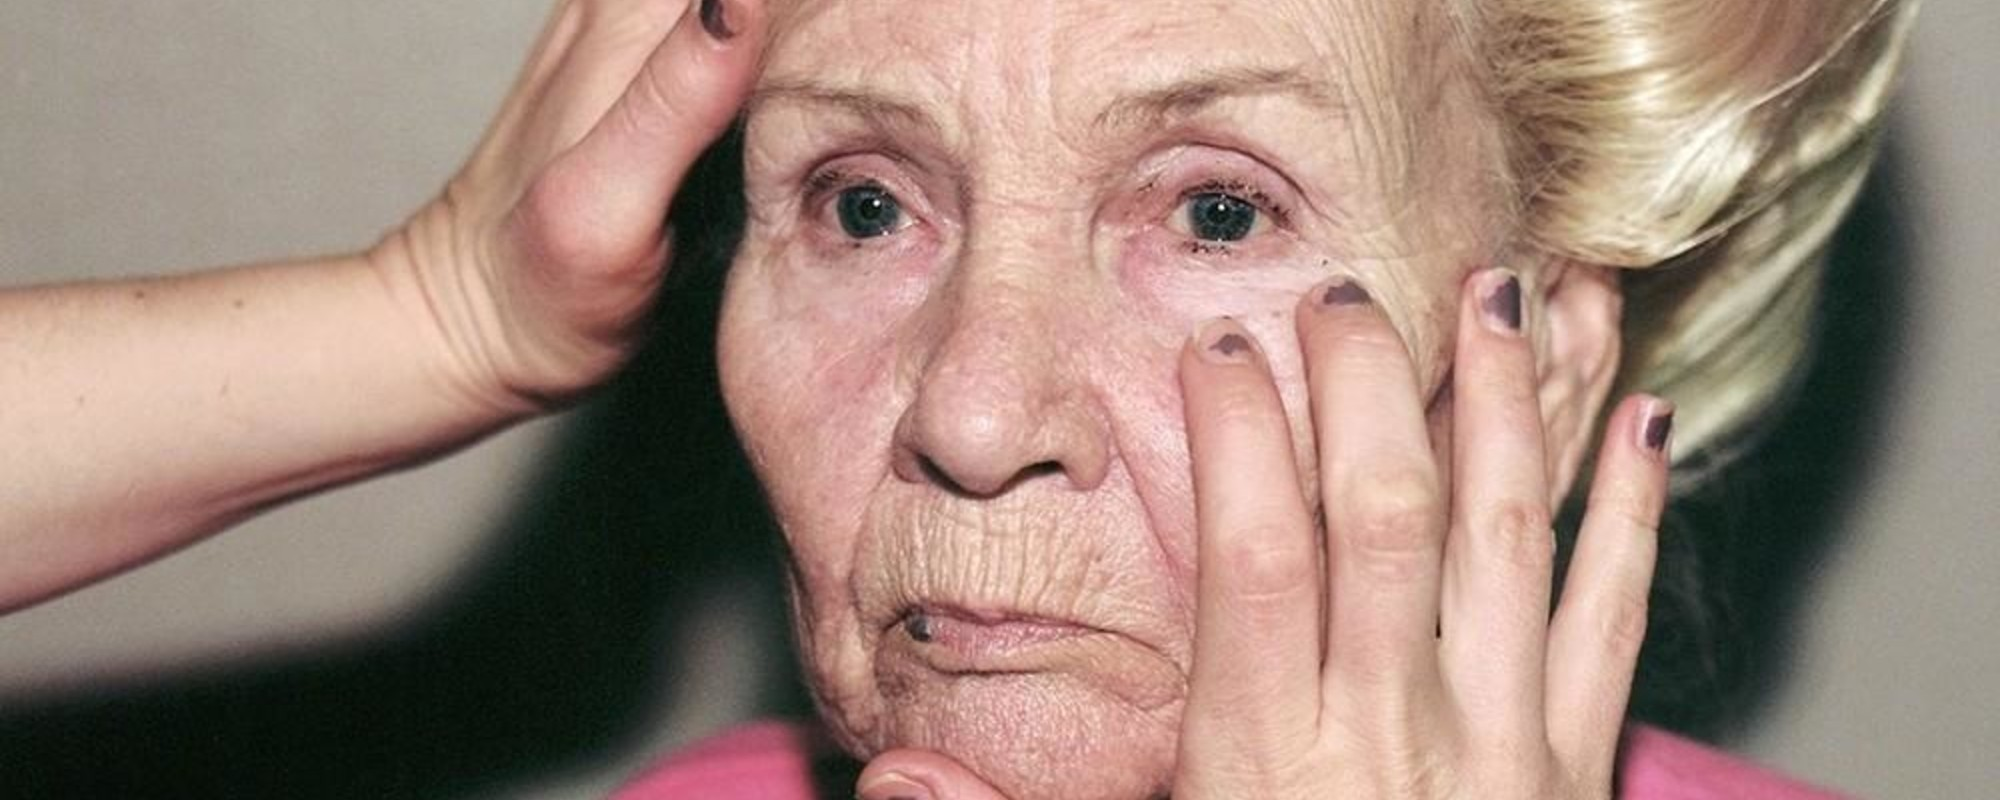 Fotos de mi abuela antes de morir